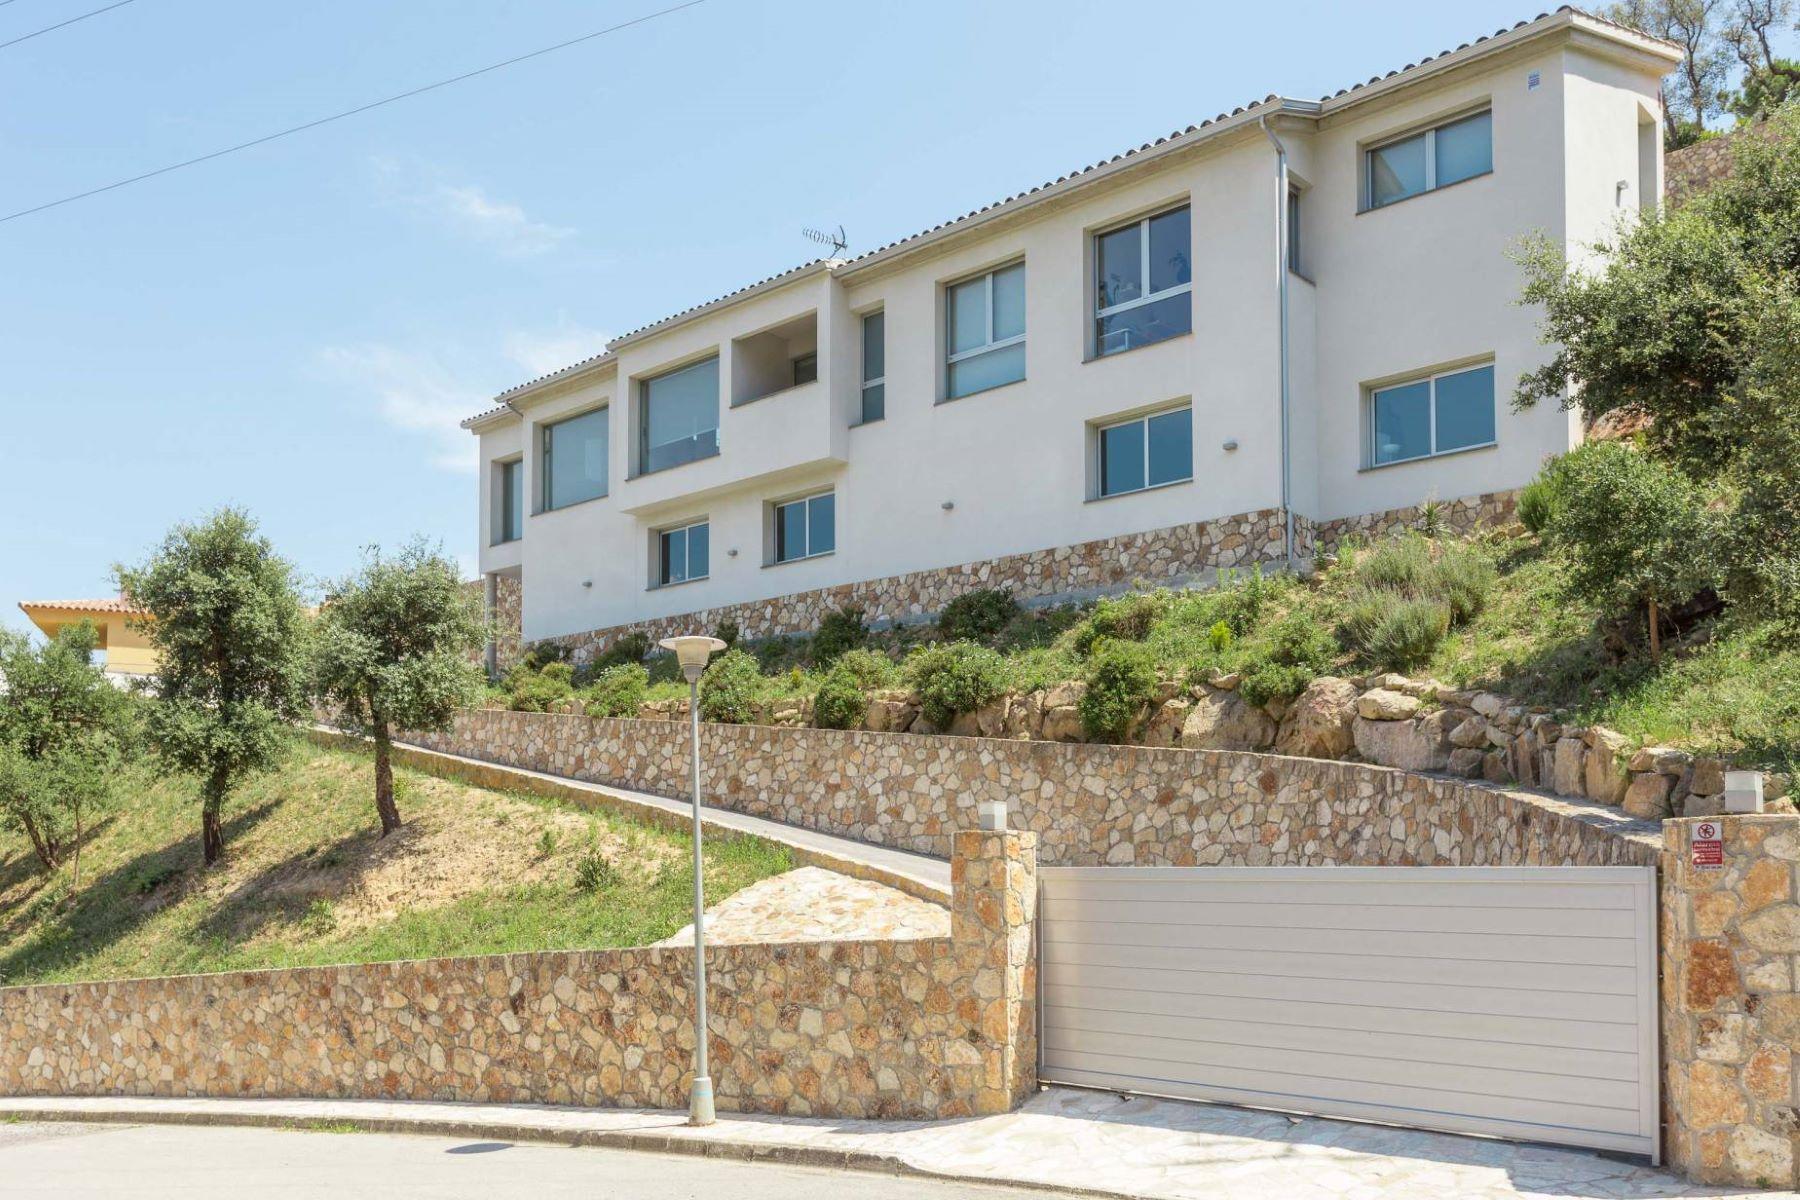 Casa Unifamiliar por un Venta en Modern house in Mas Nou Playa De Aro, Costa Brava, 17250 España